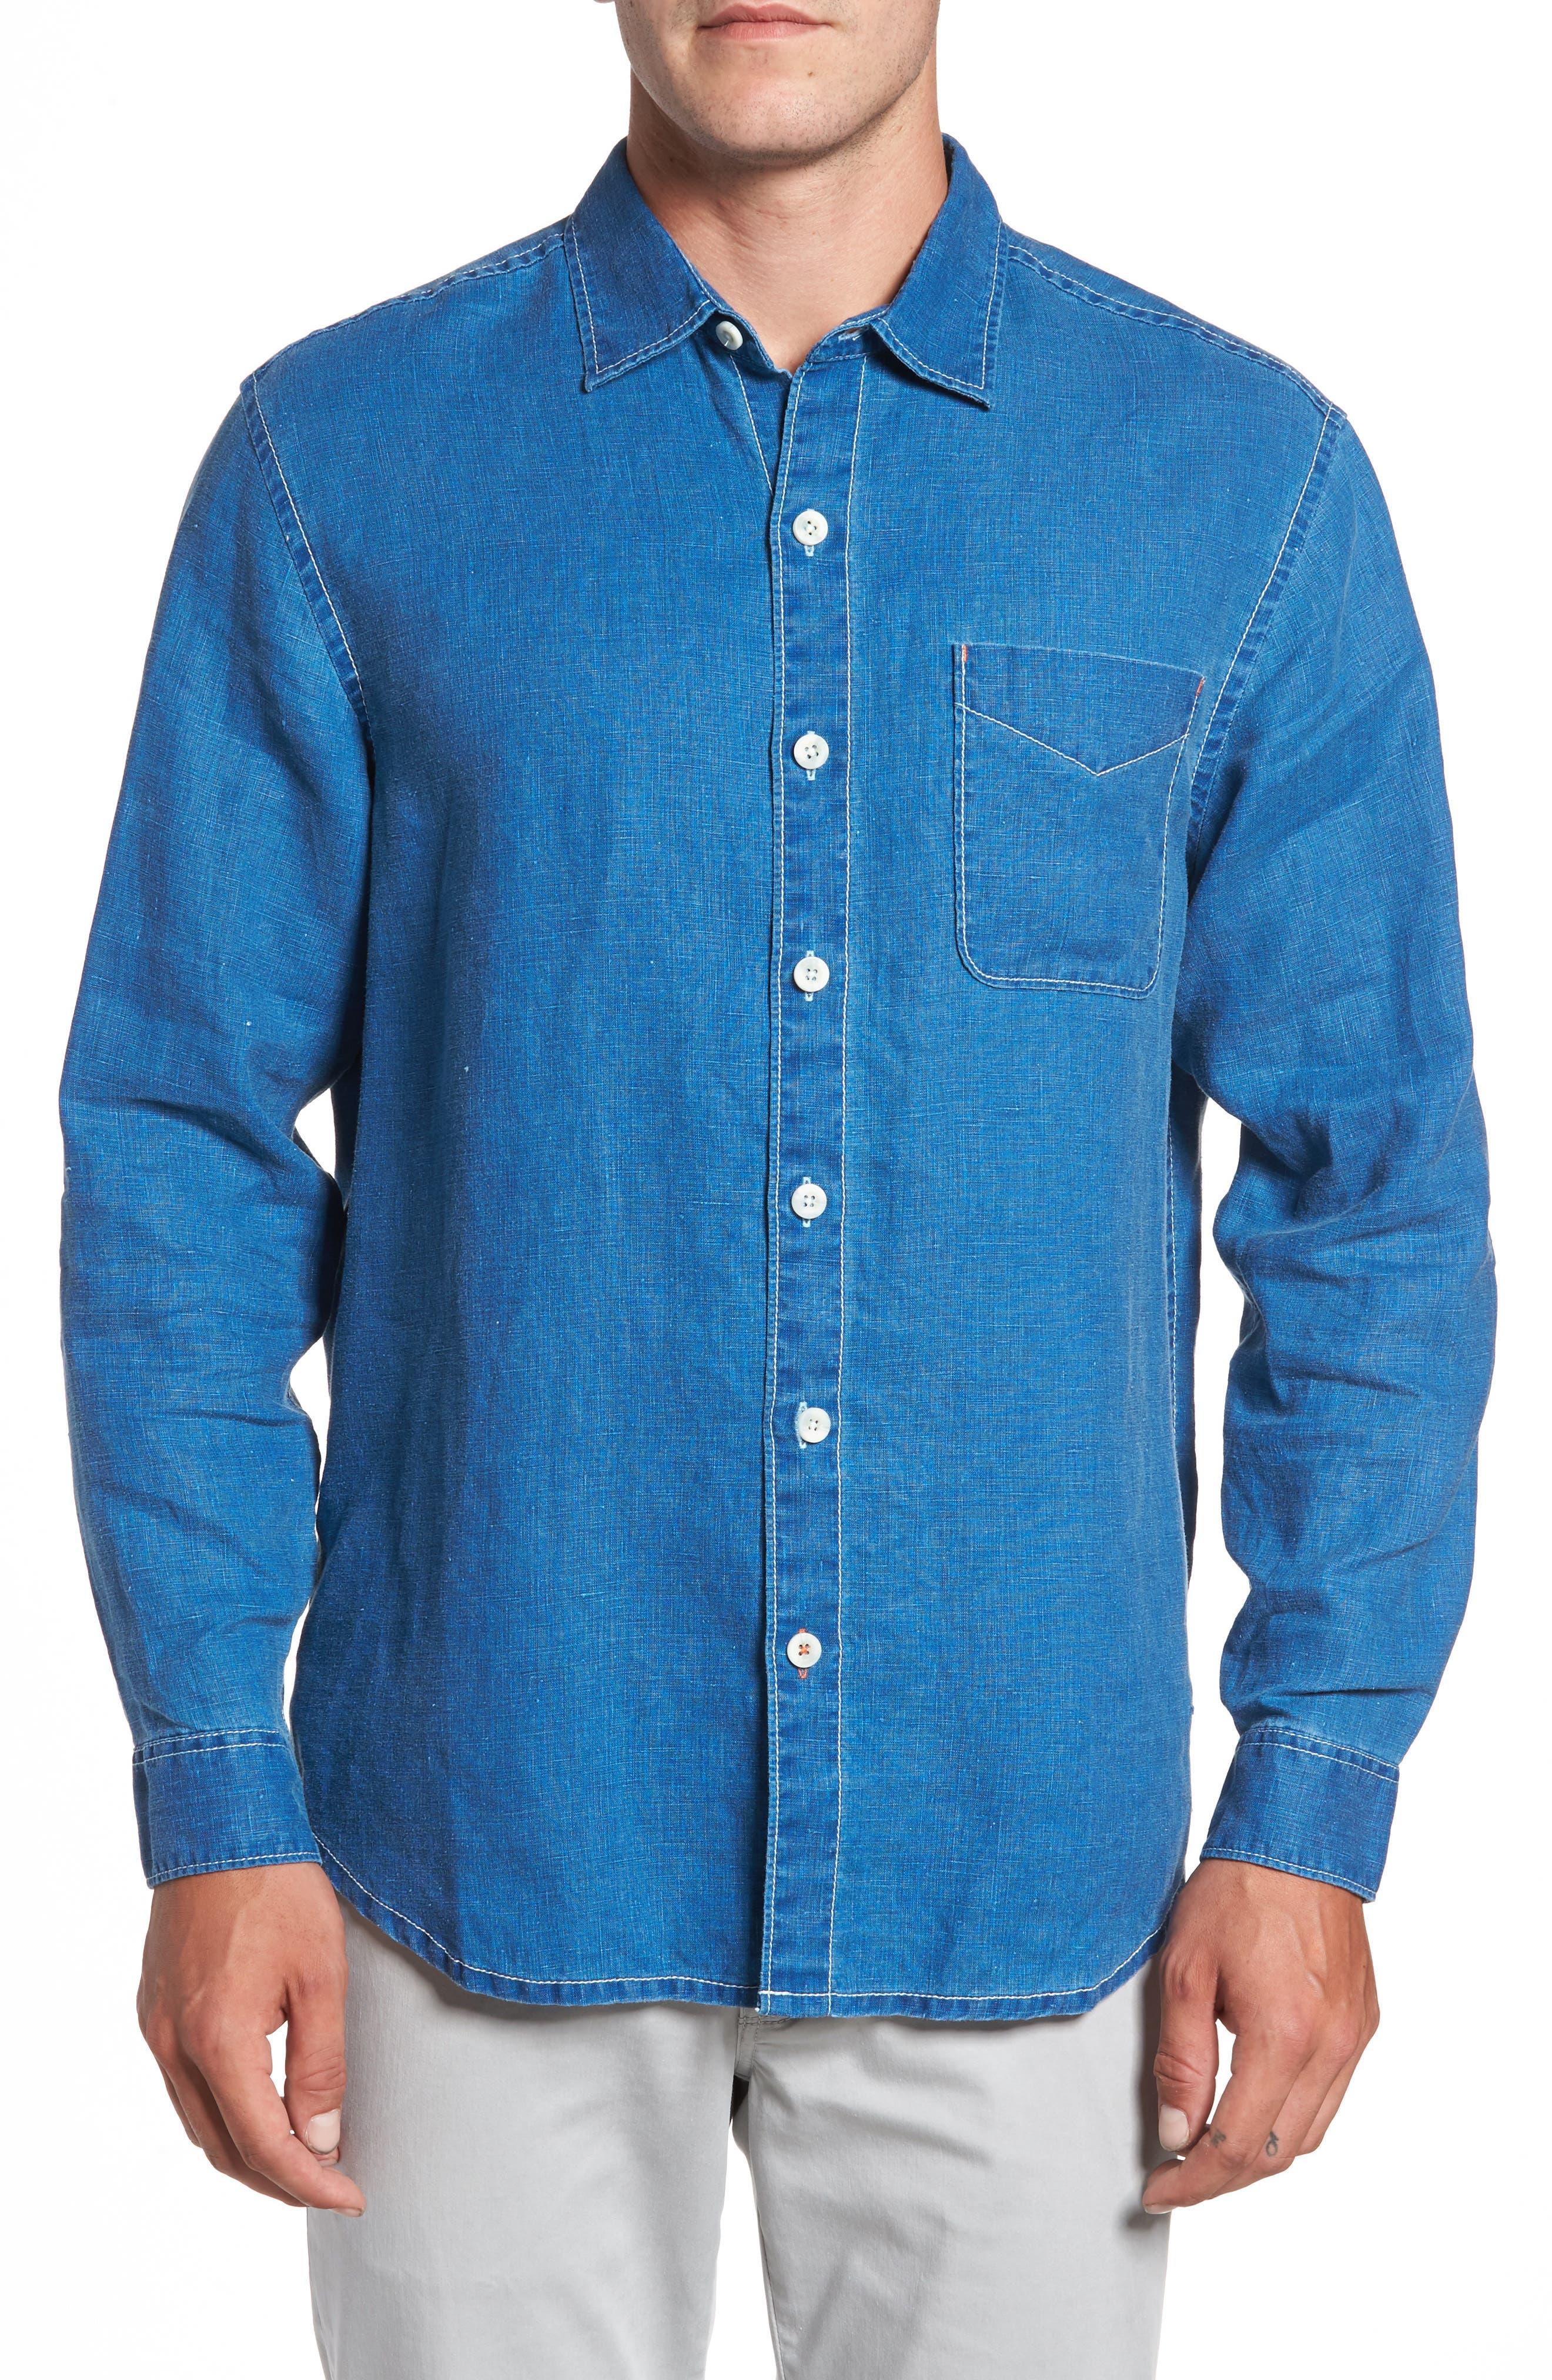 Alternate Image 1 Selected - Tommy Bahama Sea Glass Breezer Linen Sport Shirt